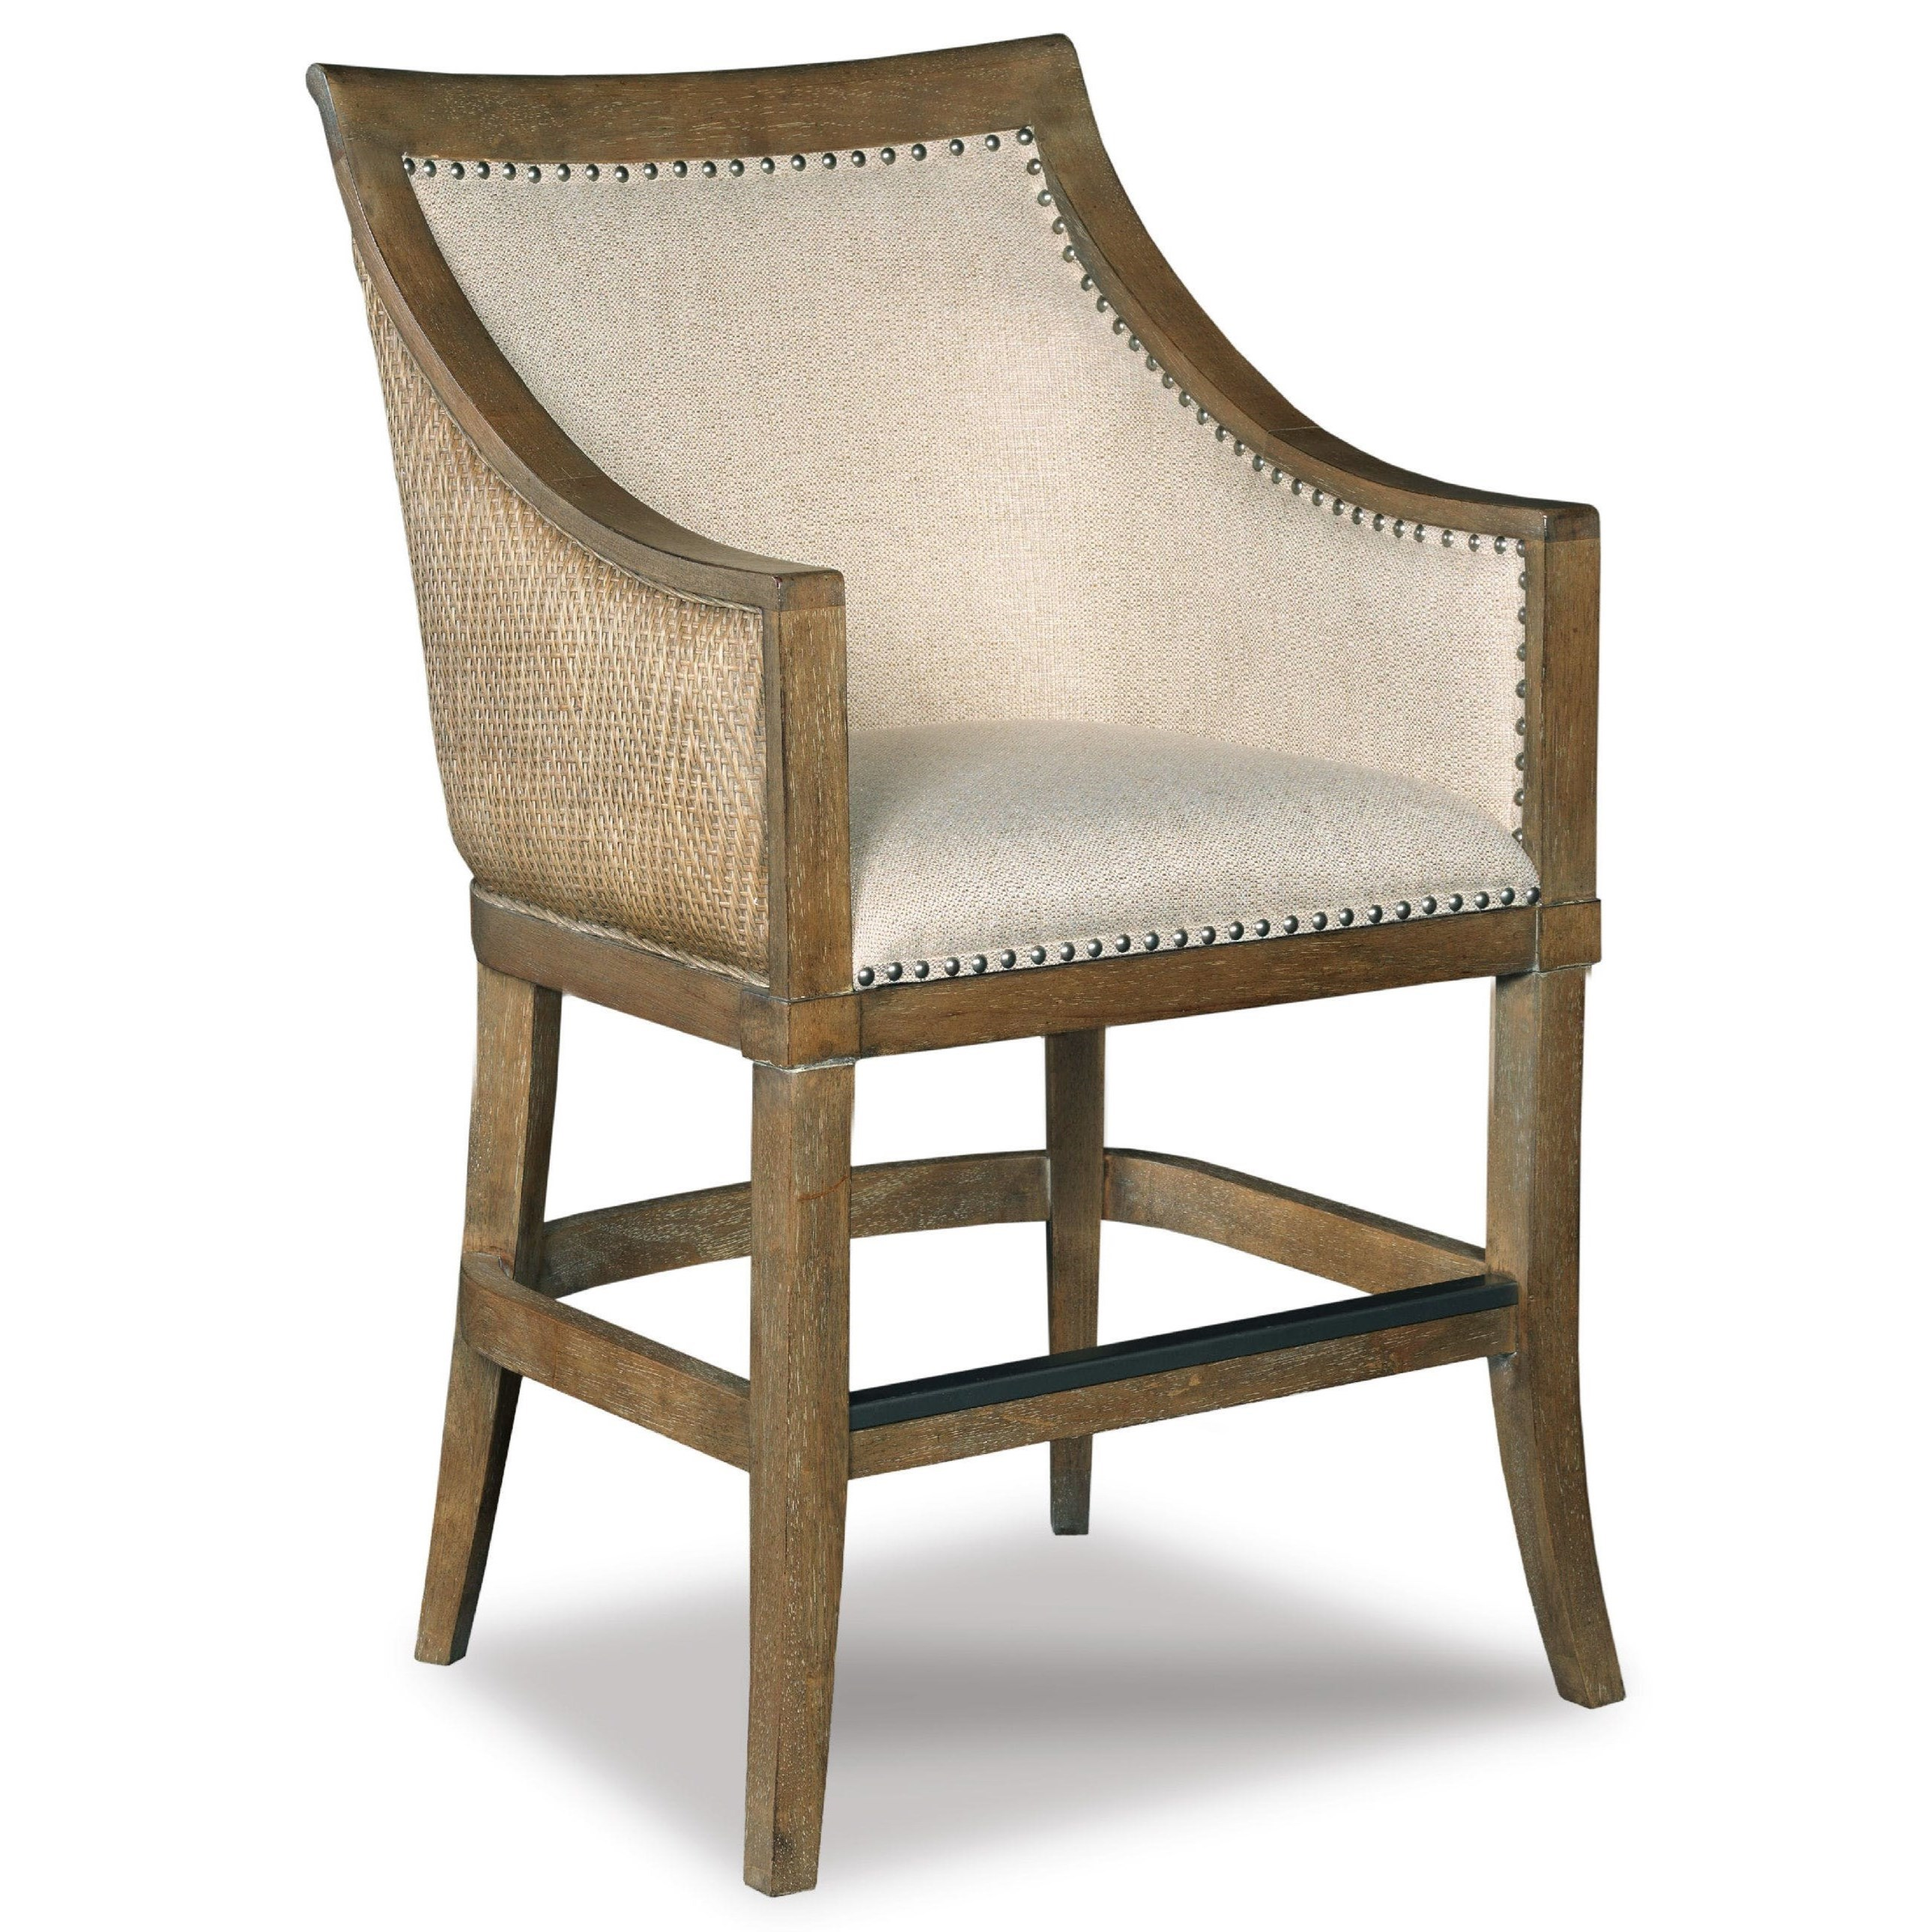 Hooker Furniture Stools Light Sea Breeze Tropical Counter Stool Olinde 39 S Furniture Bar Stools